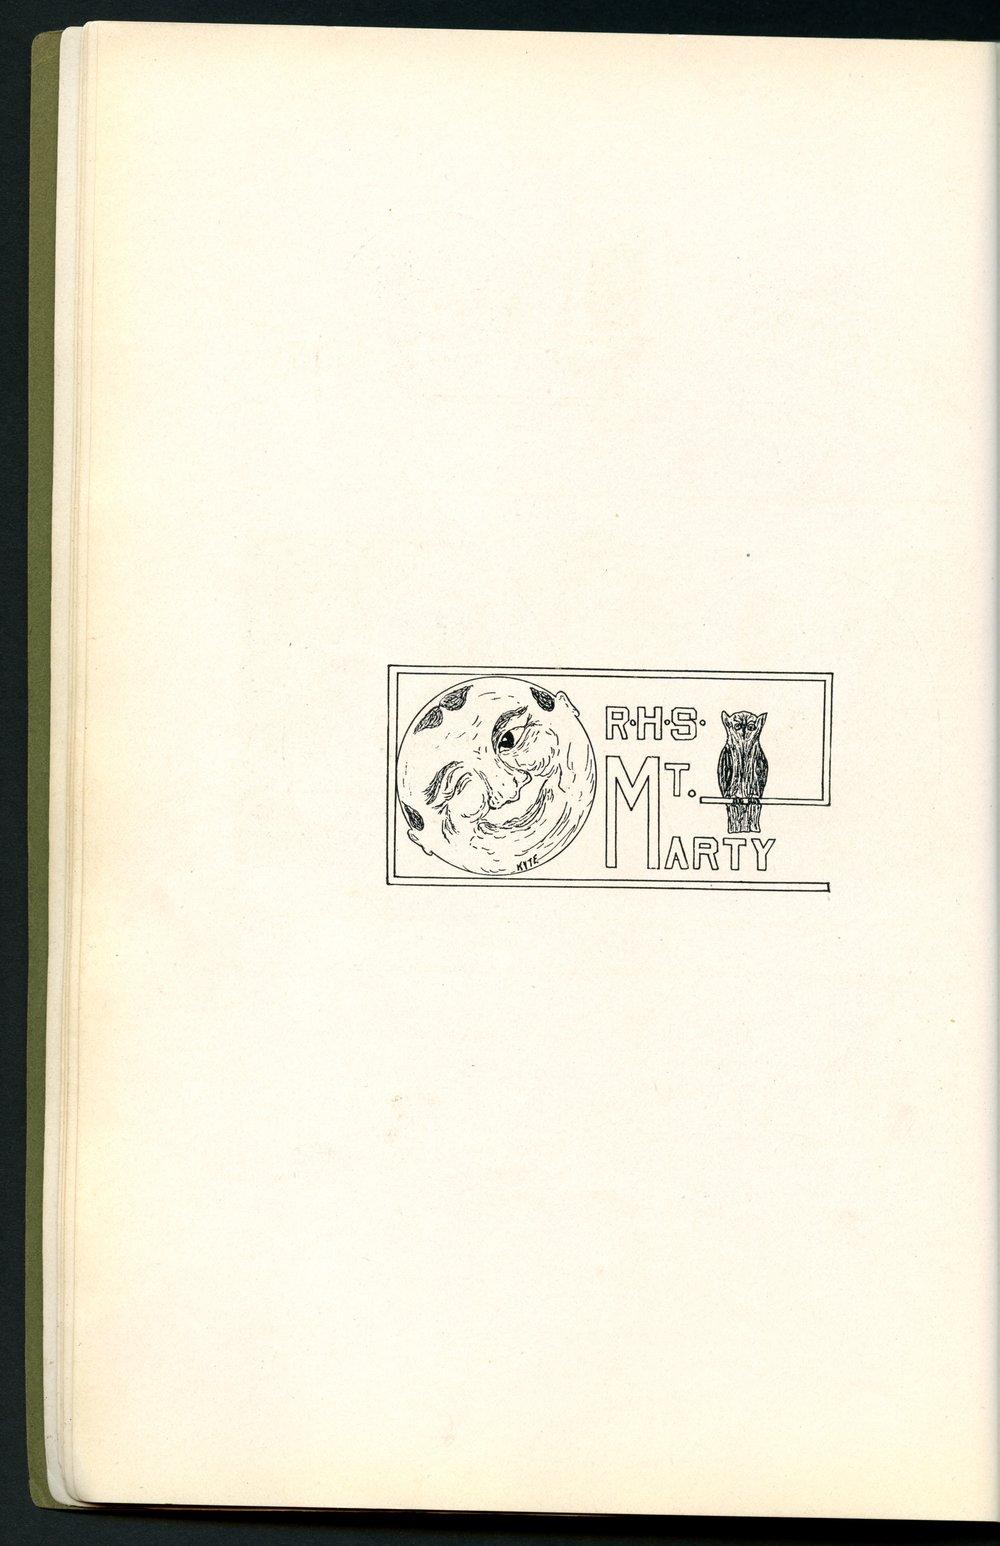 Mount Marty yearbook, 1910, Rosedale, Kansas - 10